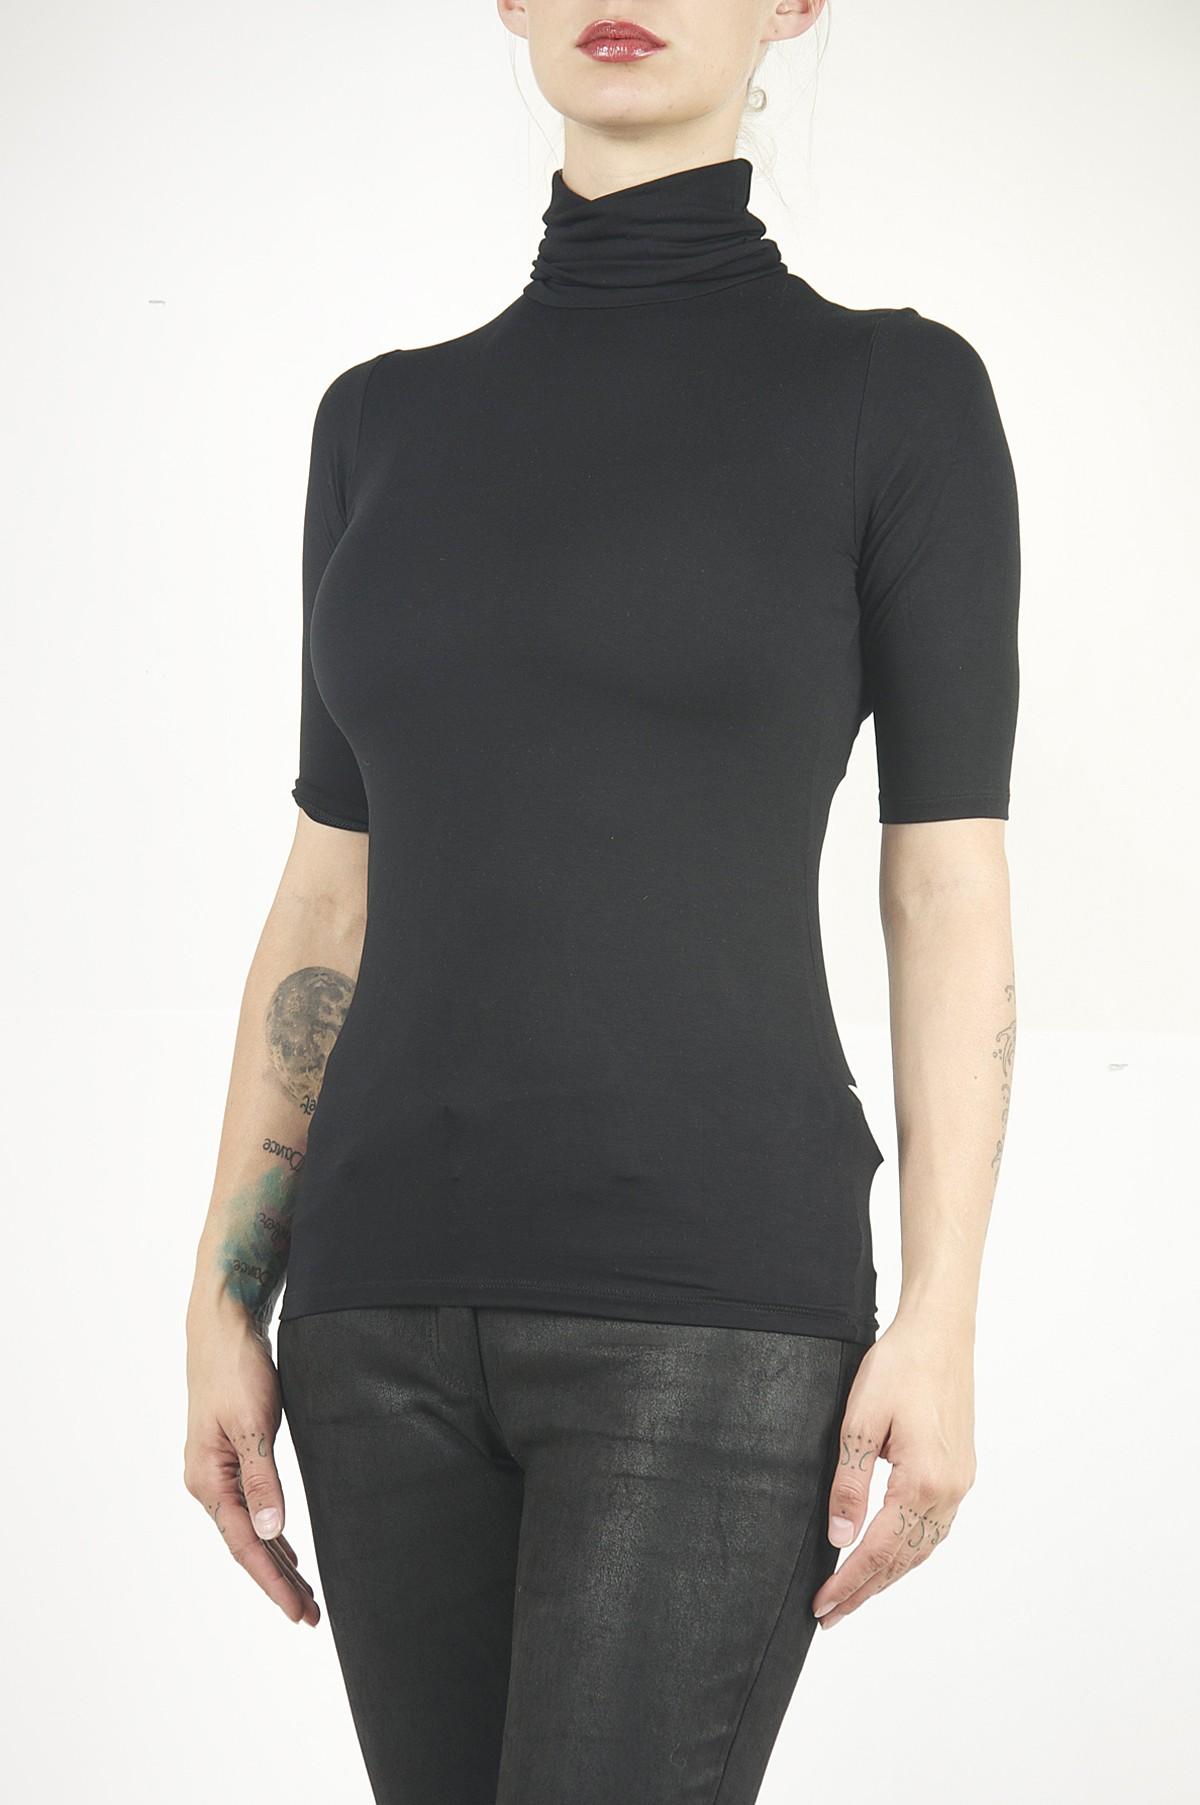 Majestic Turtleneck 3 4 Sleeve Shirt In Black Santa Fe